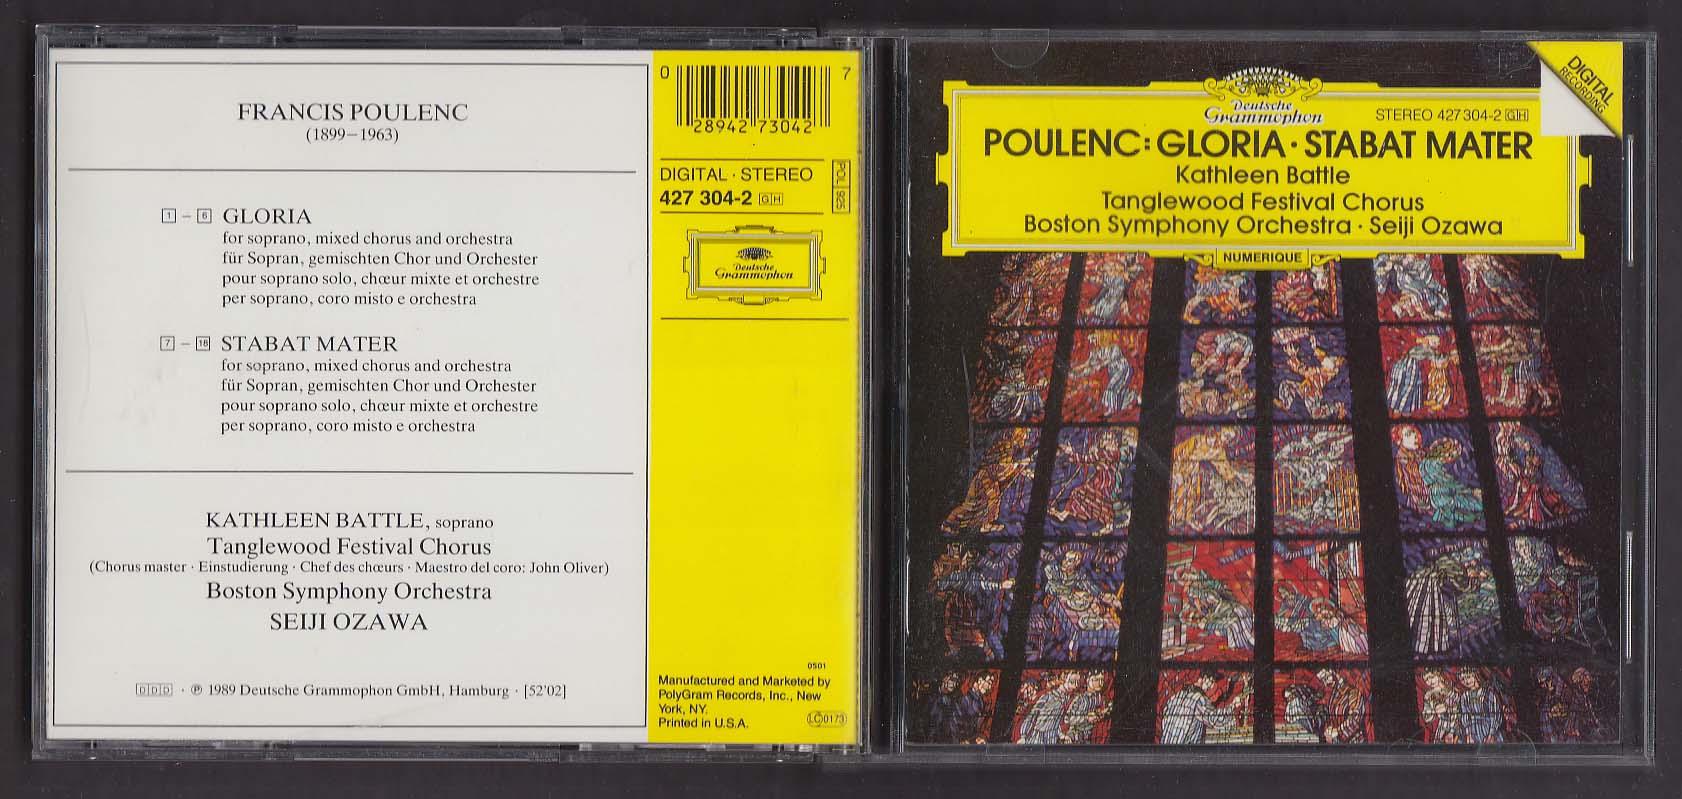 Image for Poulenc Gloria Stabat Mater Boston Symphony Deutsche Grammophon CD 1989